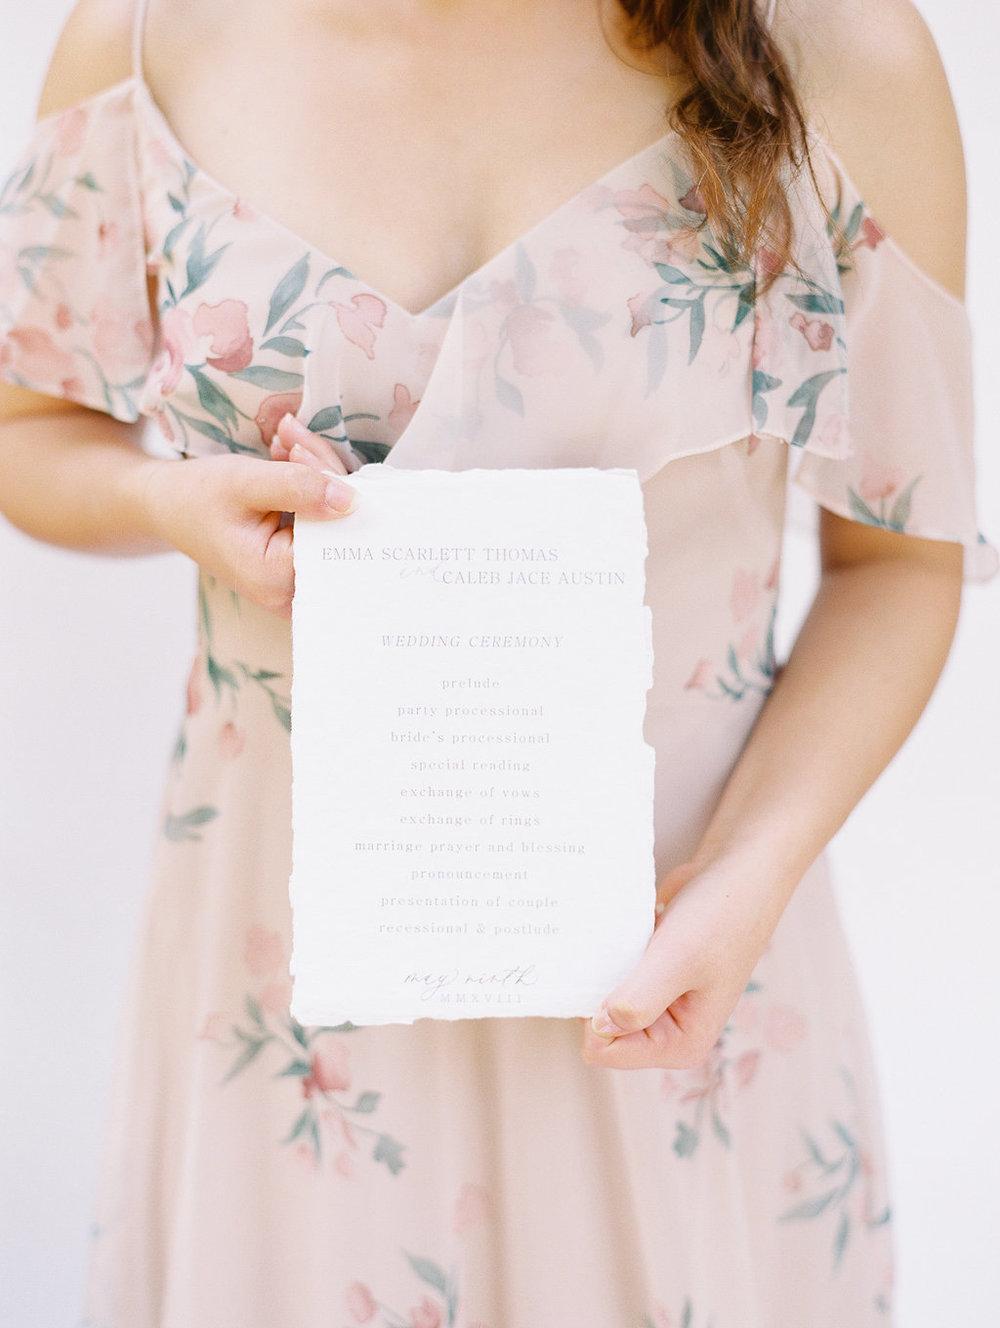 Adoption-editorial-marietta-conference-cetner-wedding-atlanta-wedding-photographer-22.jpg